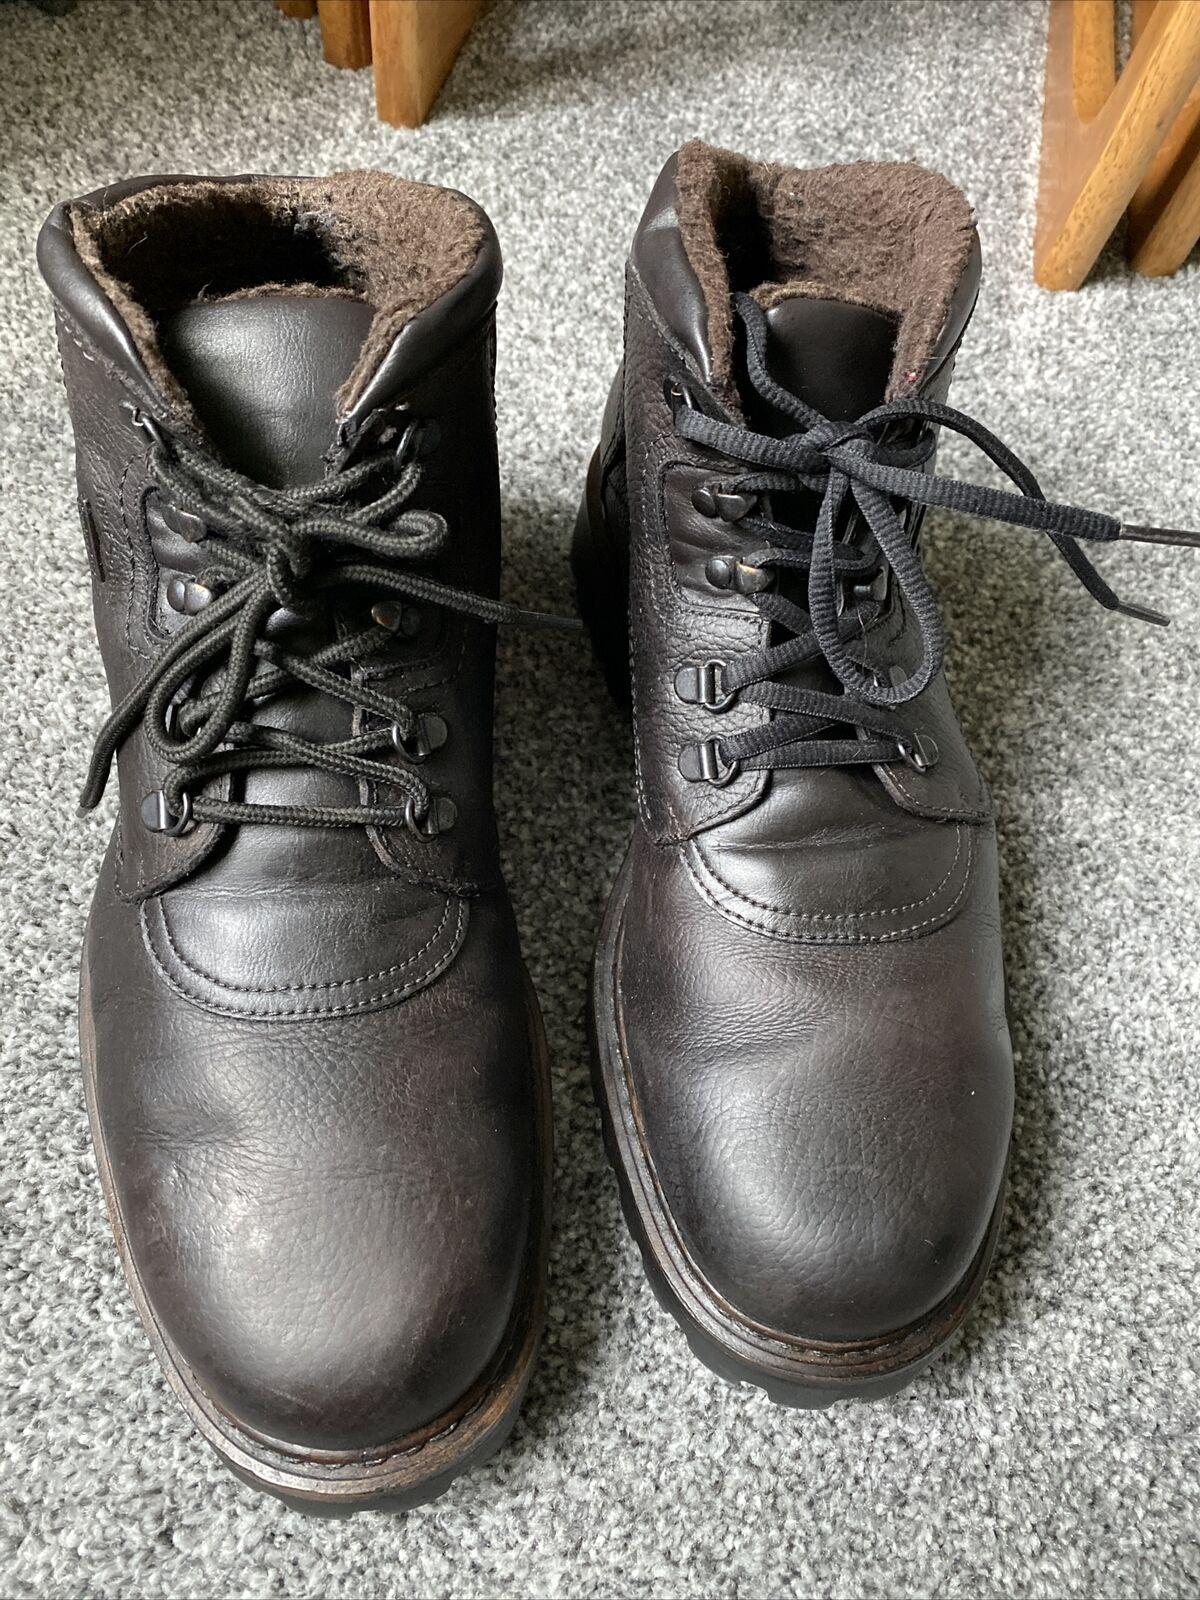 josef seibel mens boots Waterproof Leather Fleece Lined Uk 11 EU45